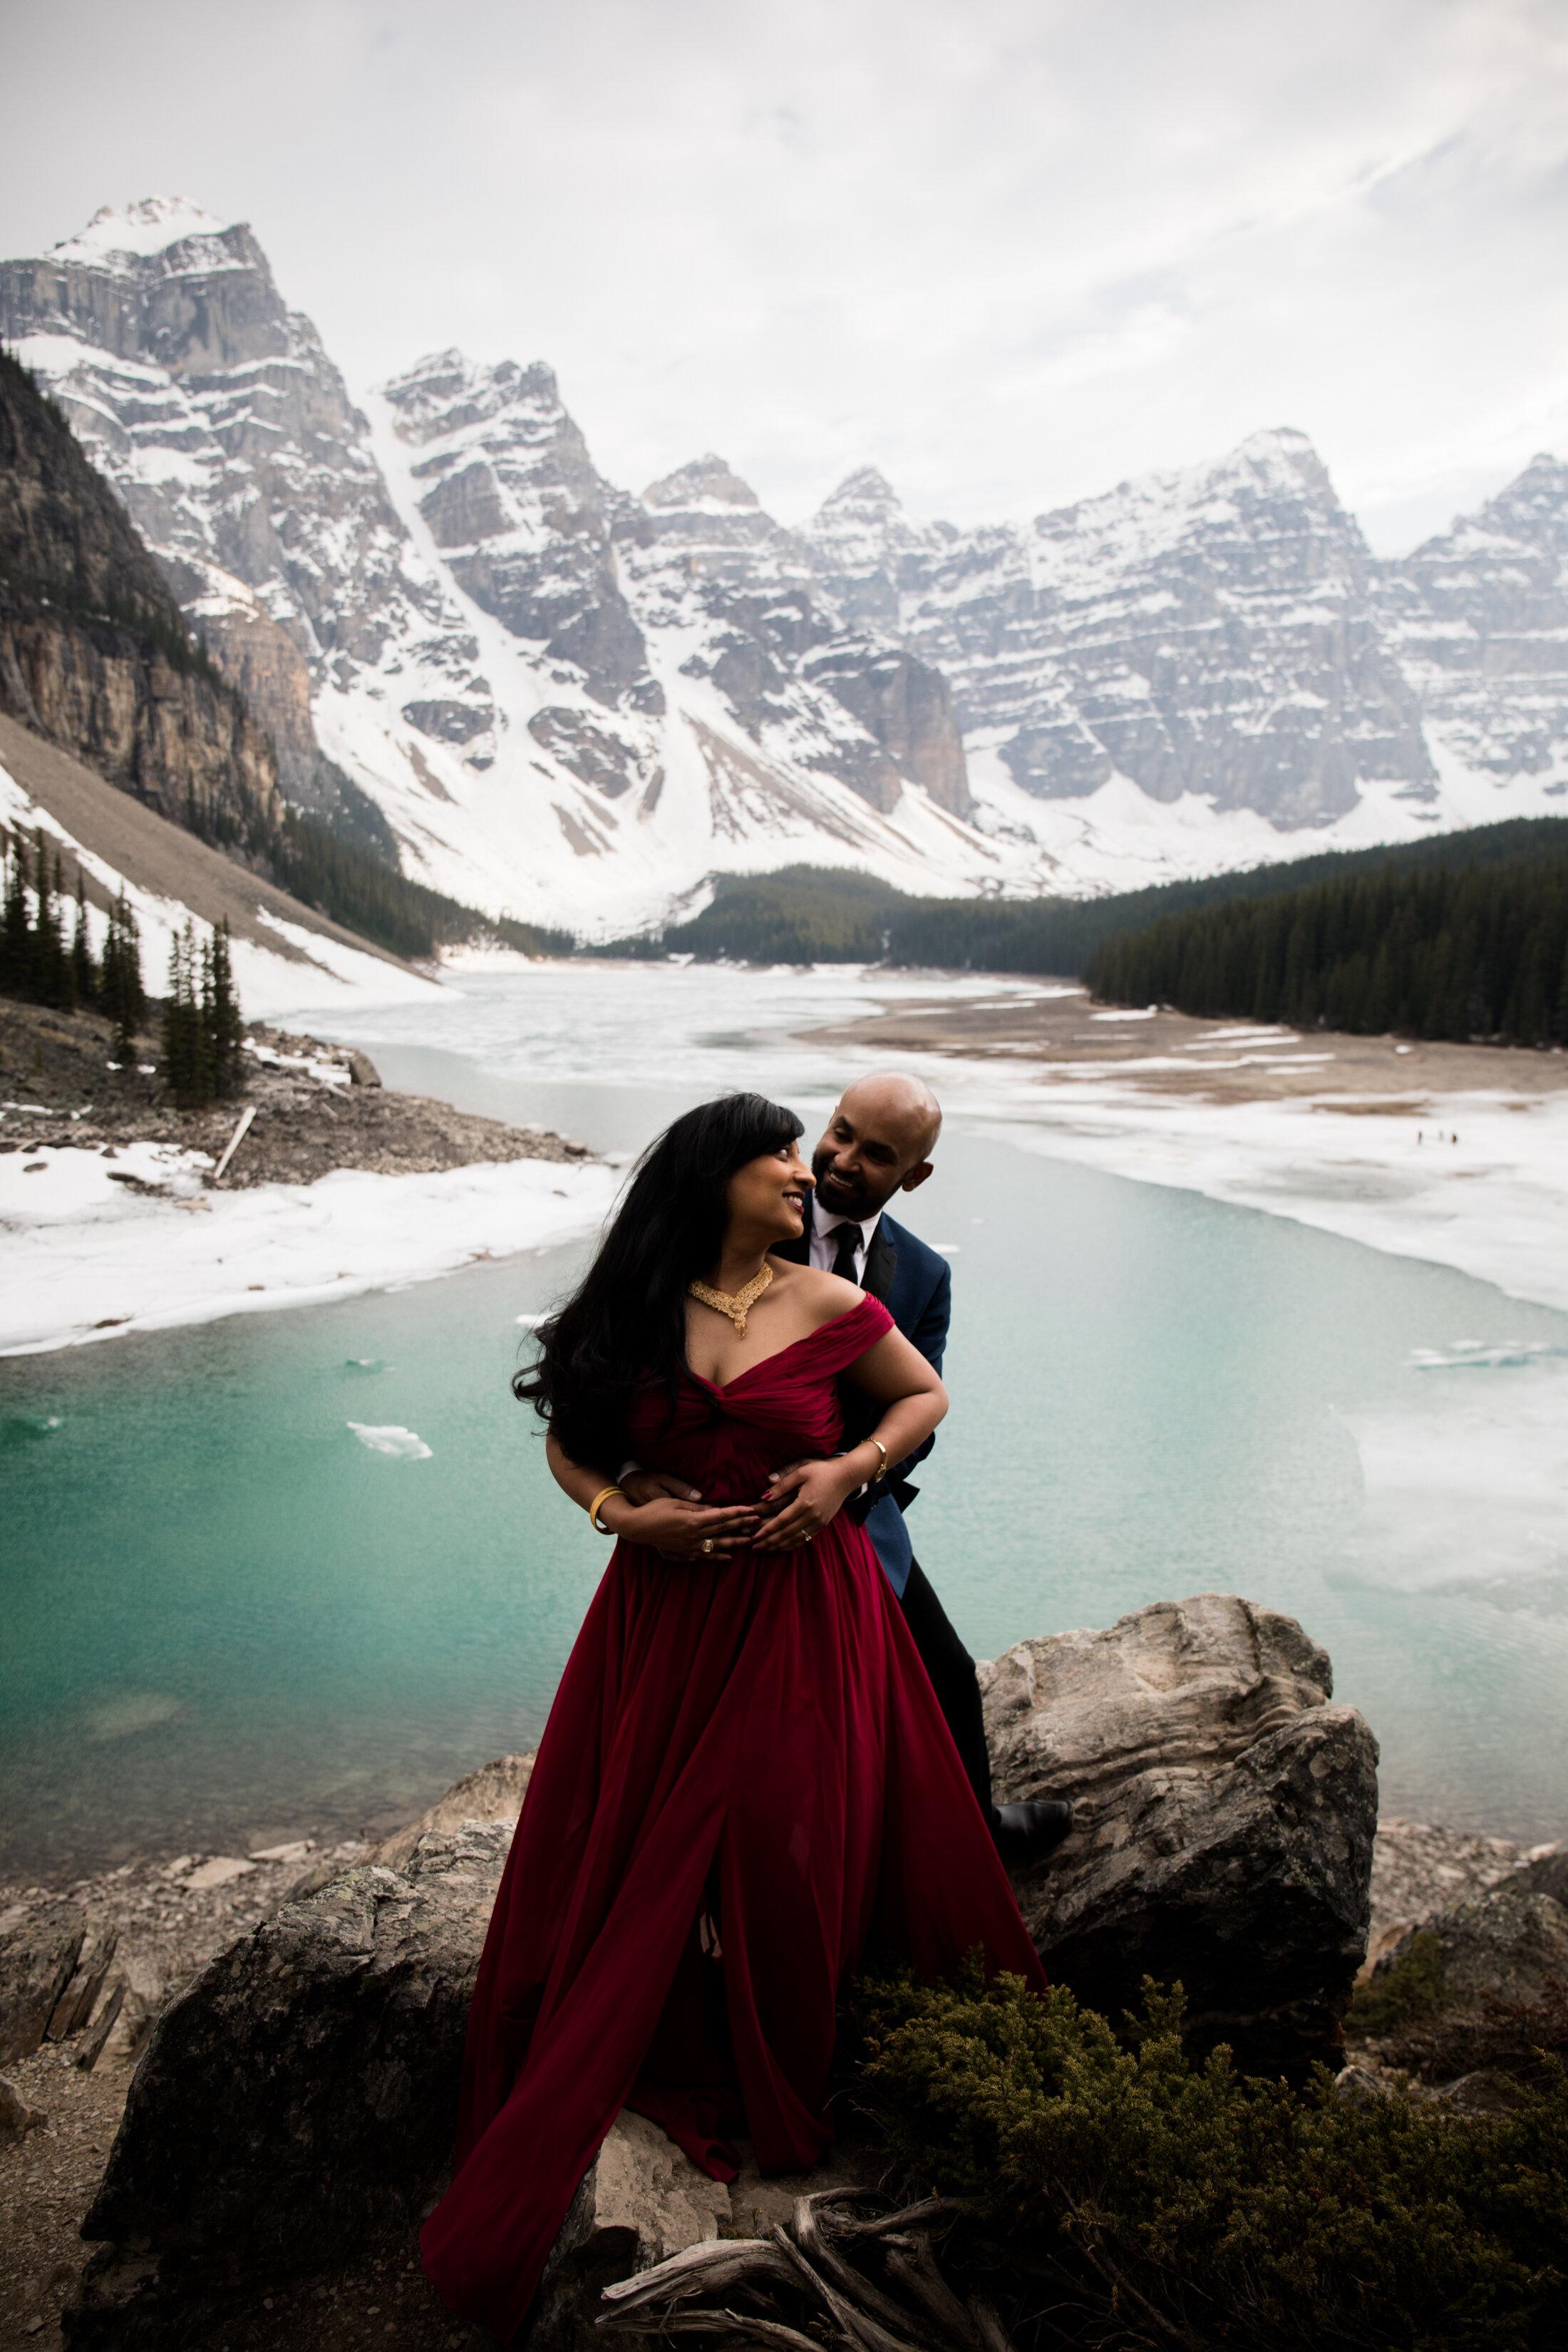 couples 2 banff-05-30-2019-anniversary-4_original.jpeg